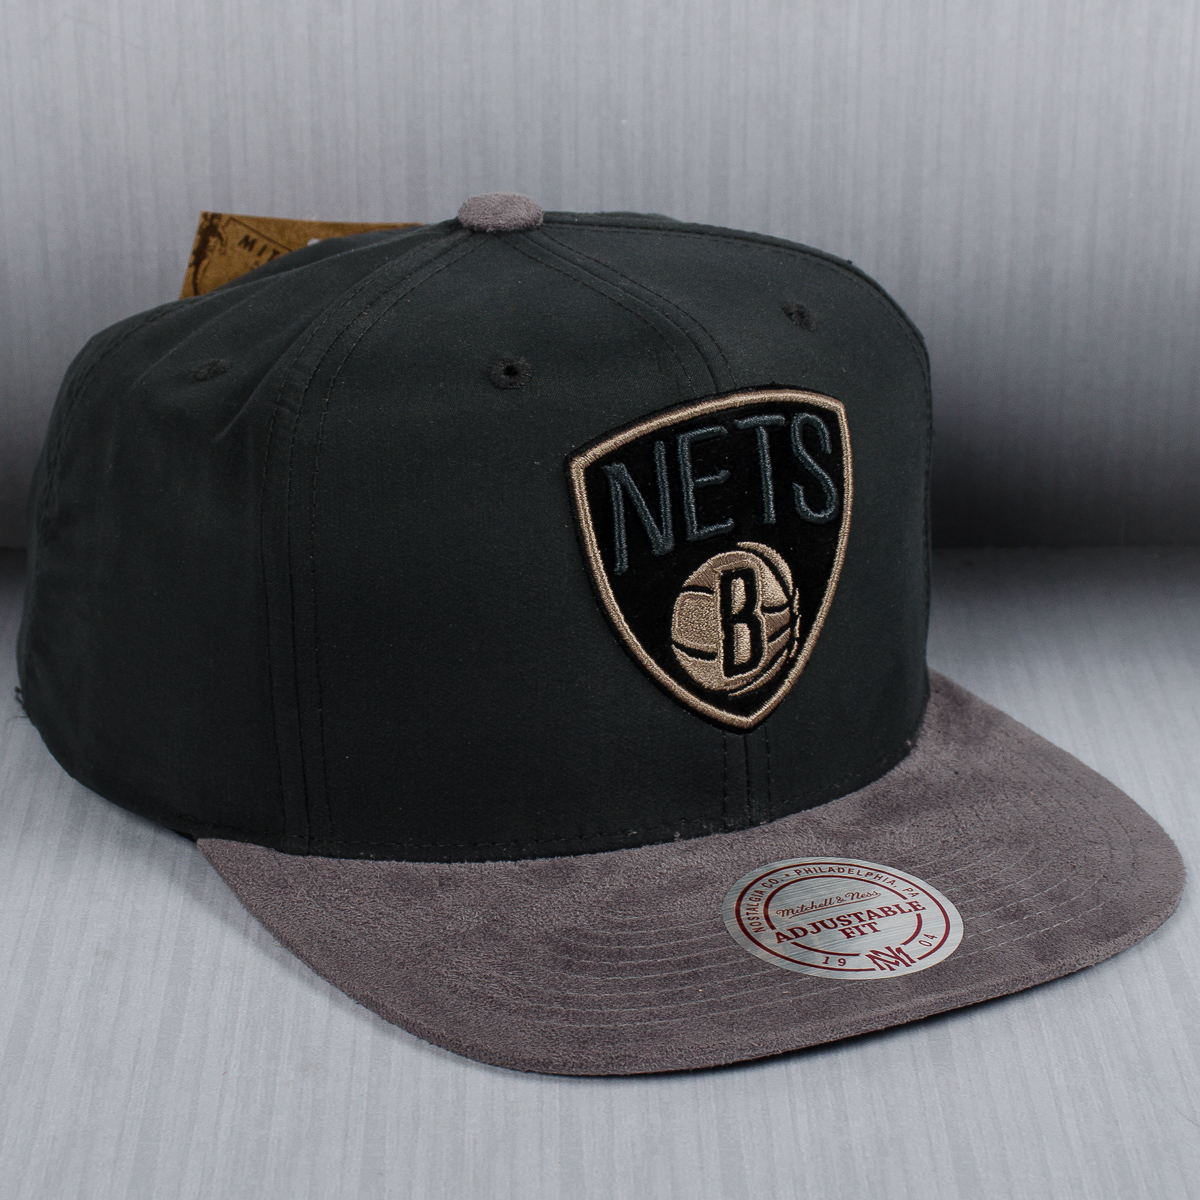 faef6b631 Mitchell & Ness NBA Brooklyn Nets Buttery Snapback Cap - NBA Shop ...